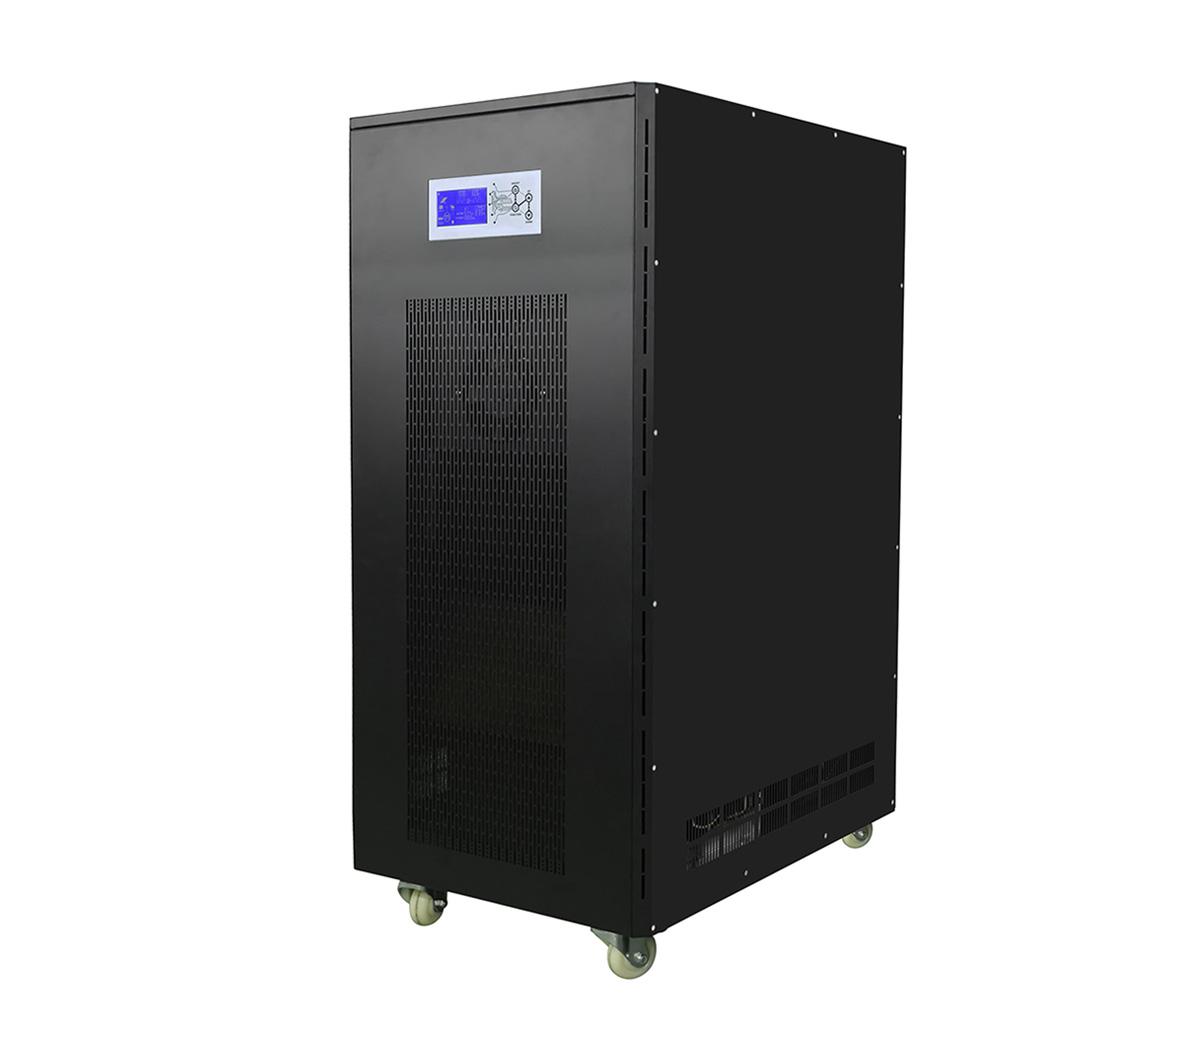 3 phase hybrid inverter 30kva-80kva